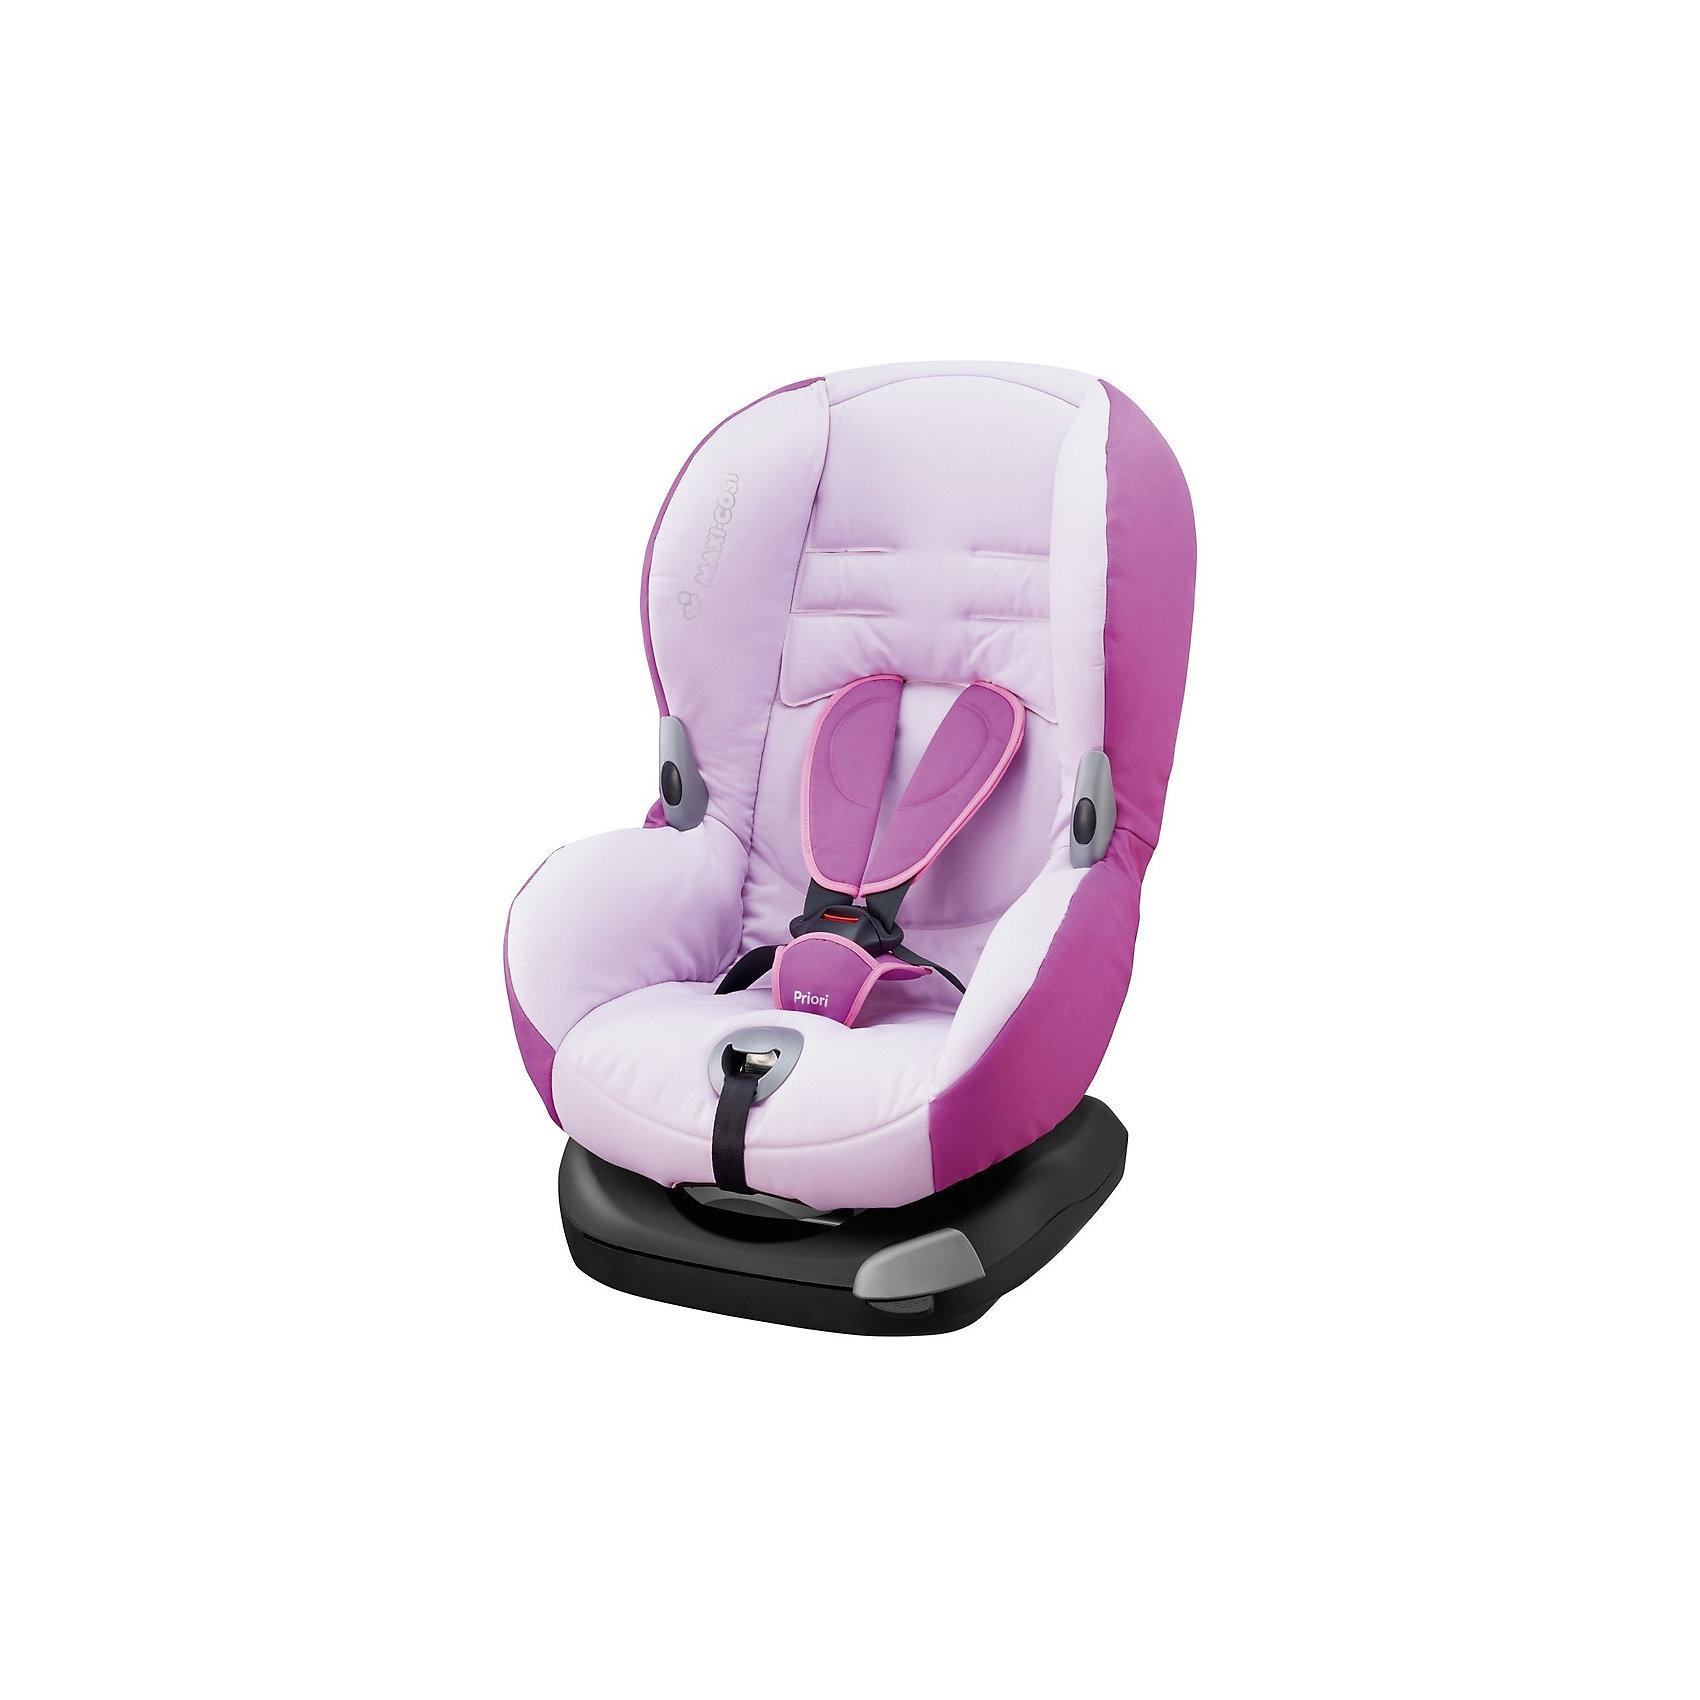 Maxi Cosi Автокресло Maxi-Cosi Priori ХР 9-18 кг, Marble Pink